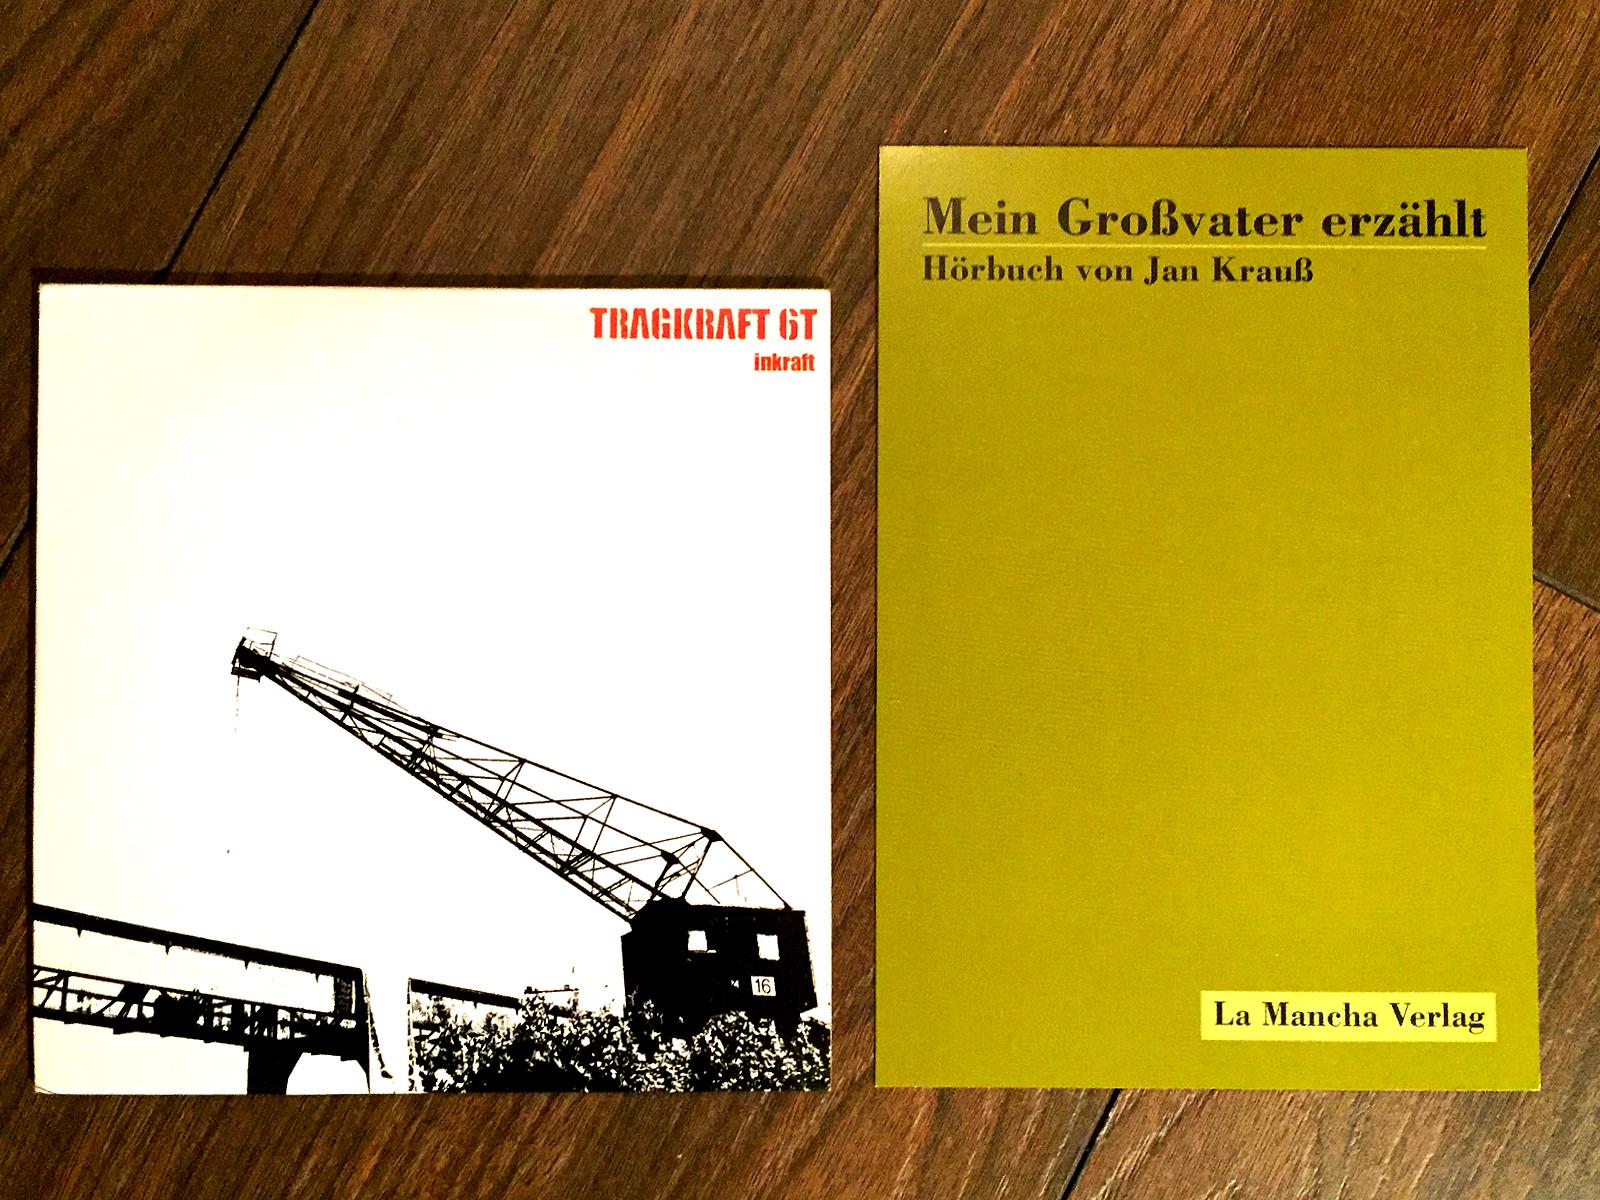 la-mancha-Verlag